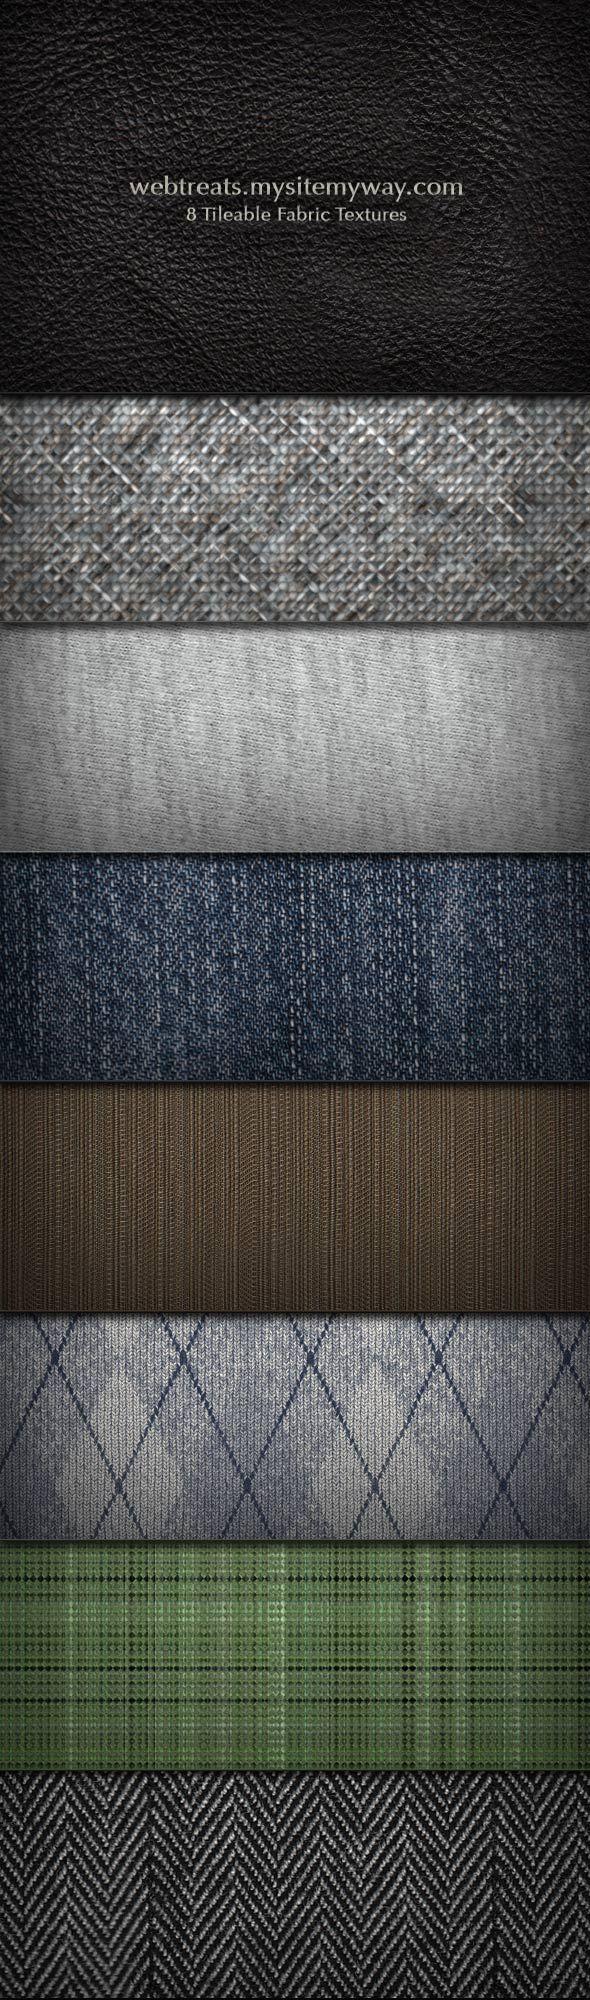 Fabric Texture and Pattern Set by WebTreatsETC.deviantart.com on @DeviantArt